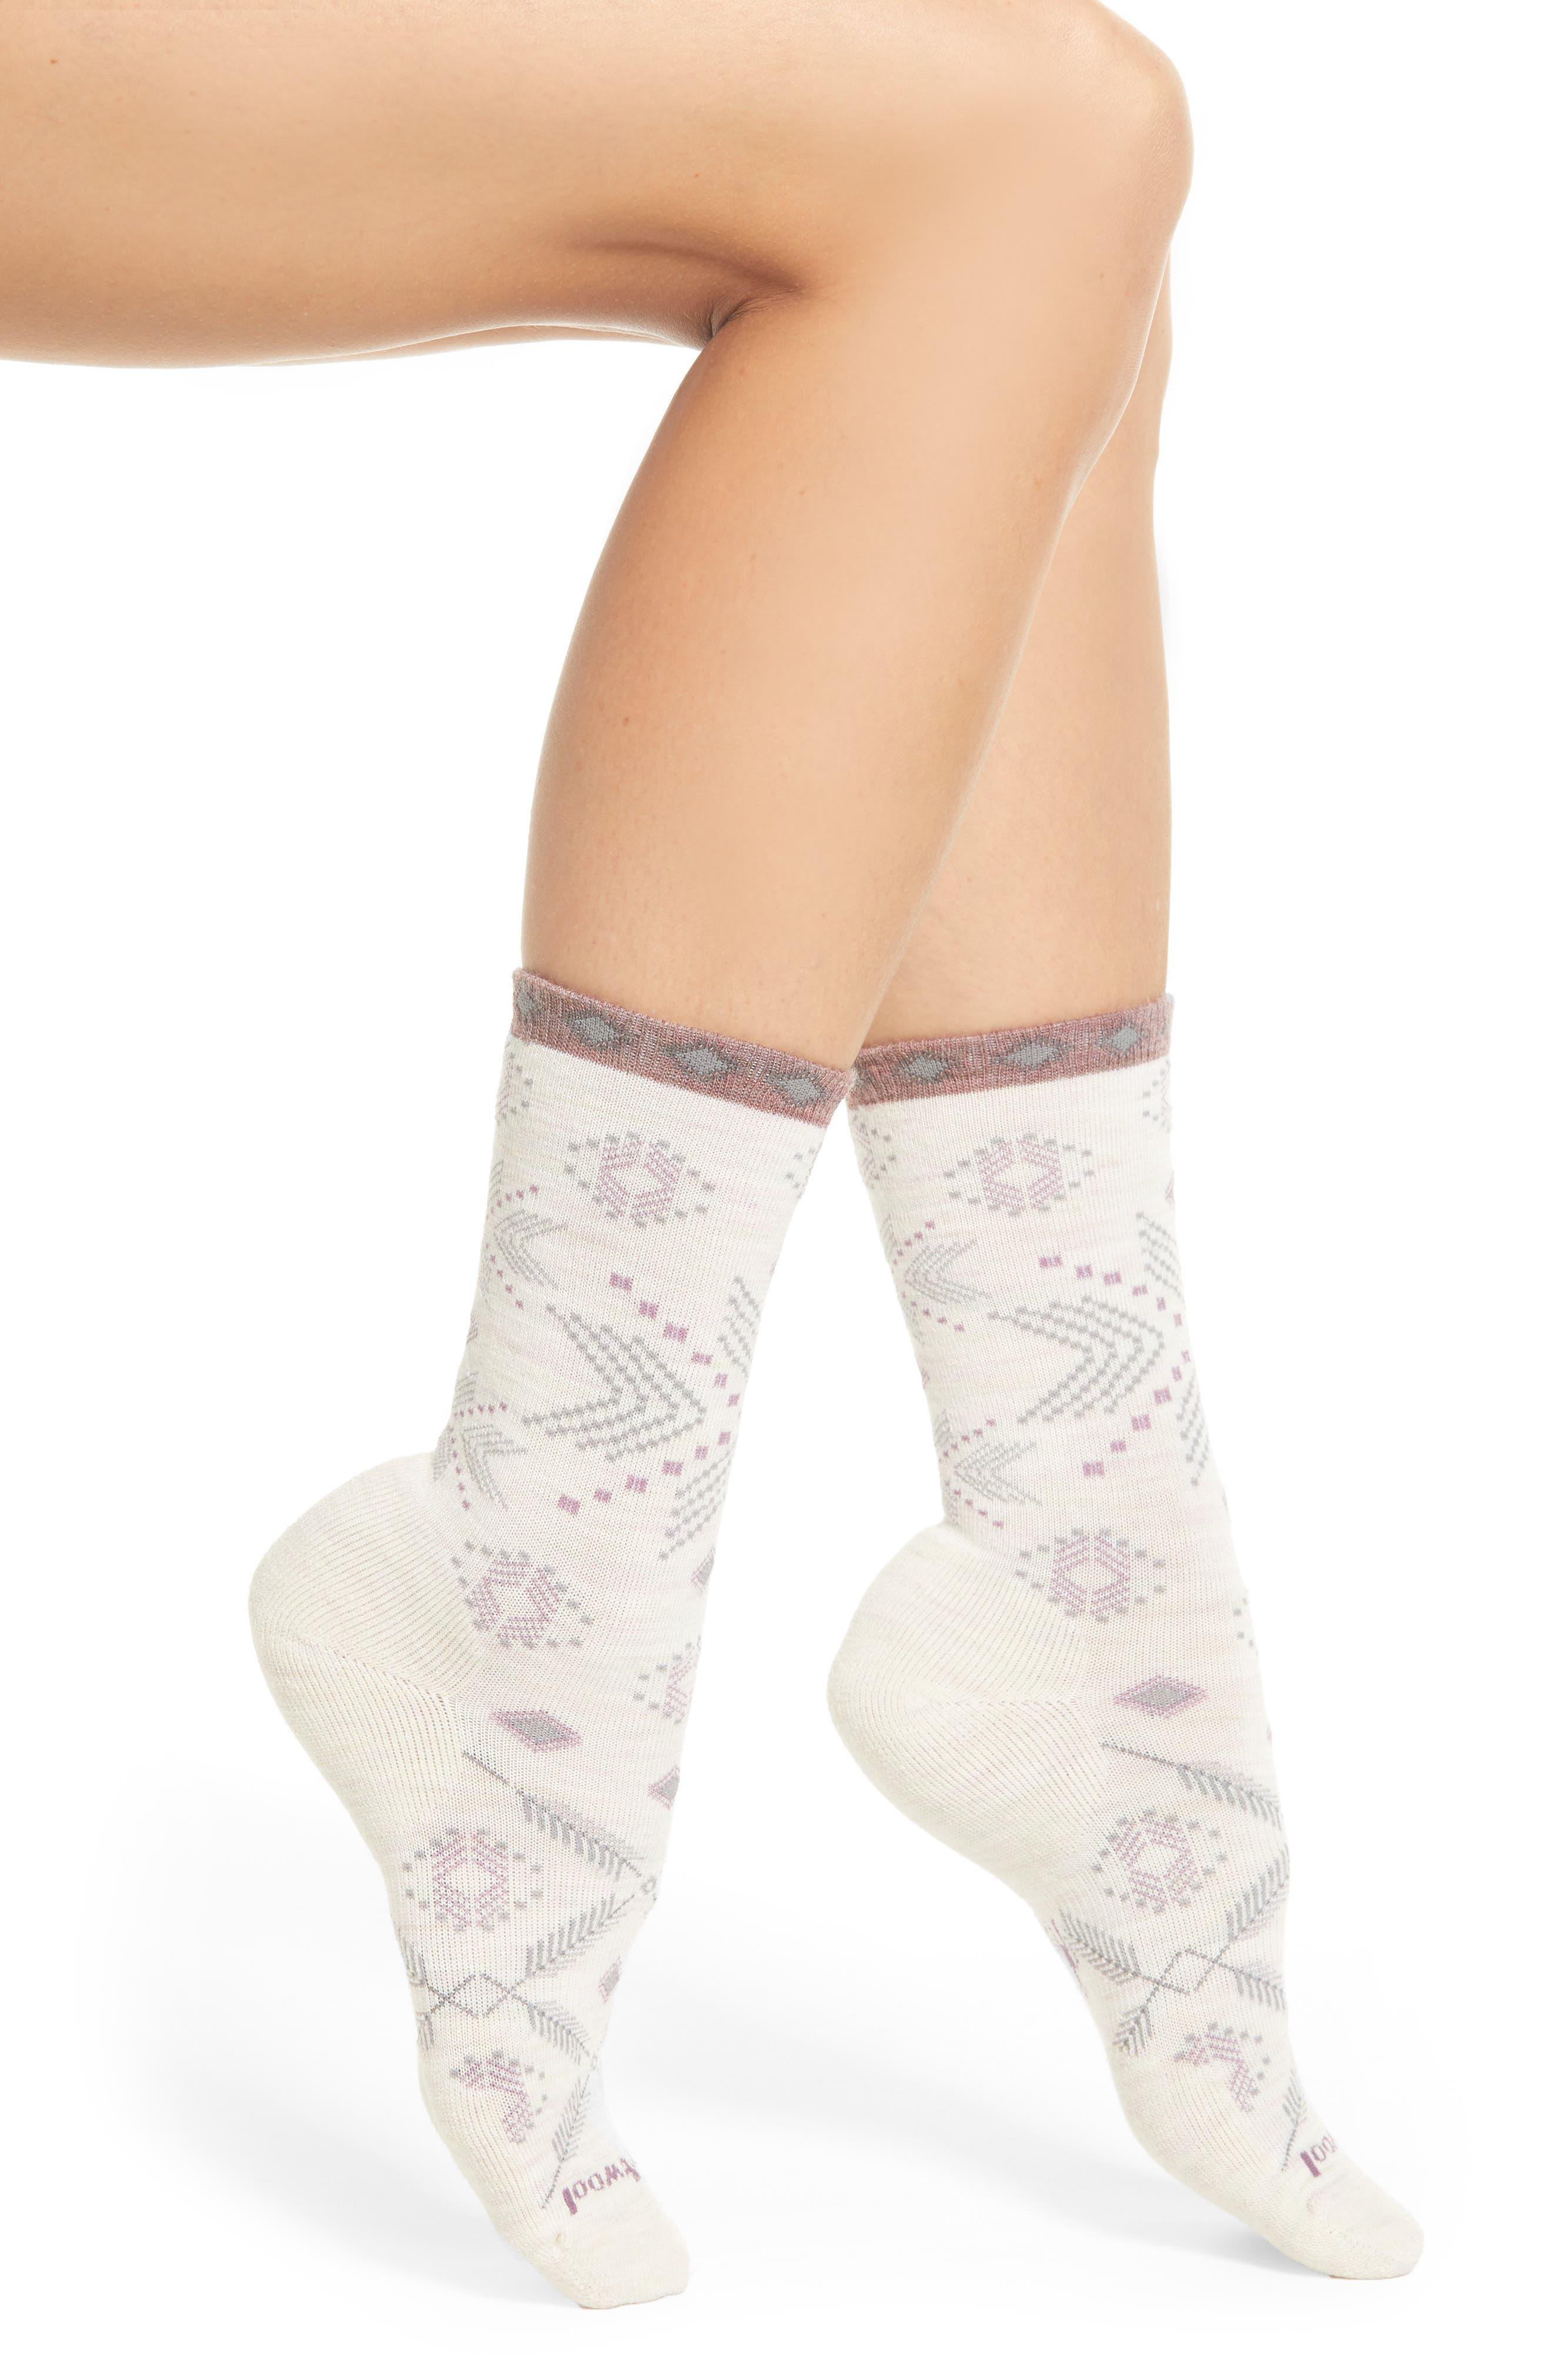 Dasher Crew Socks,                             Main thumbnail 1, color,                             MOONBEAM HEATHER